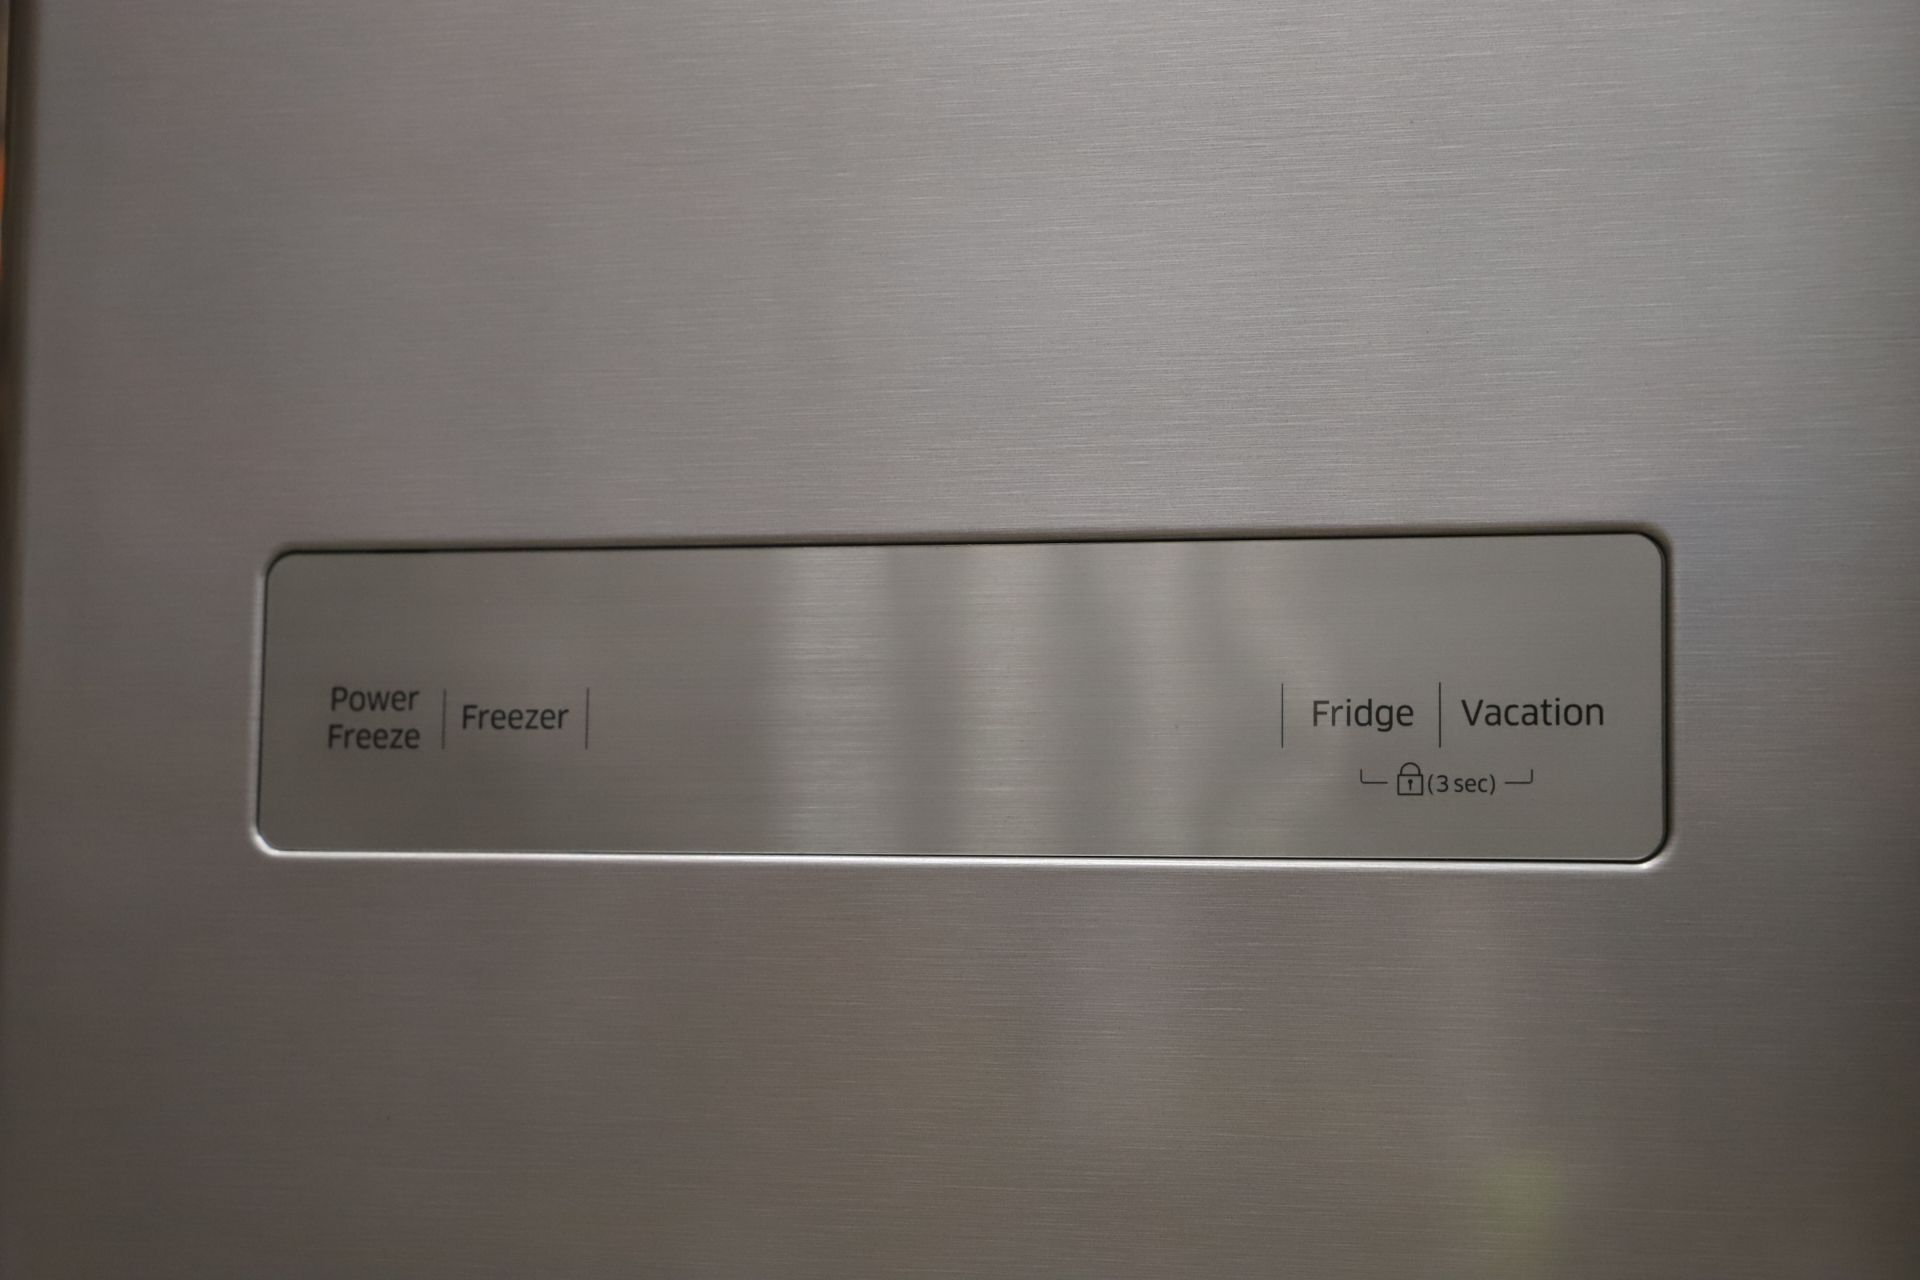 Pallet of 1 Samsung plain door Fridge freezer. Latest selling price £899.99 - Image 4 of 7